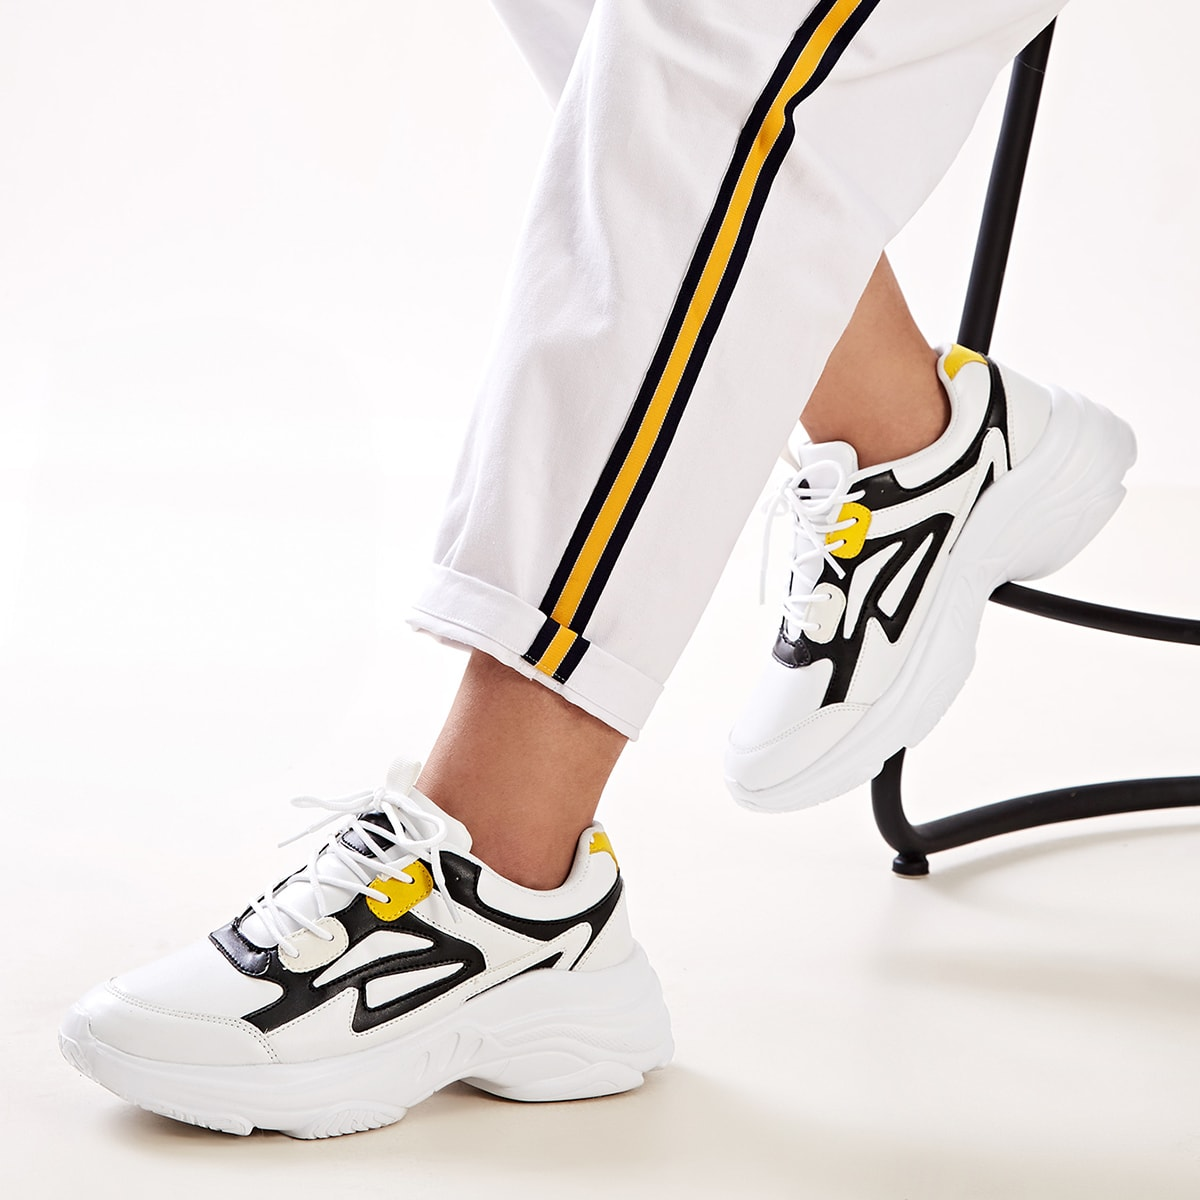 Zwart & wit Comfortabel sneakers Kant